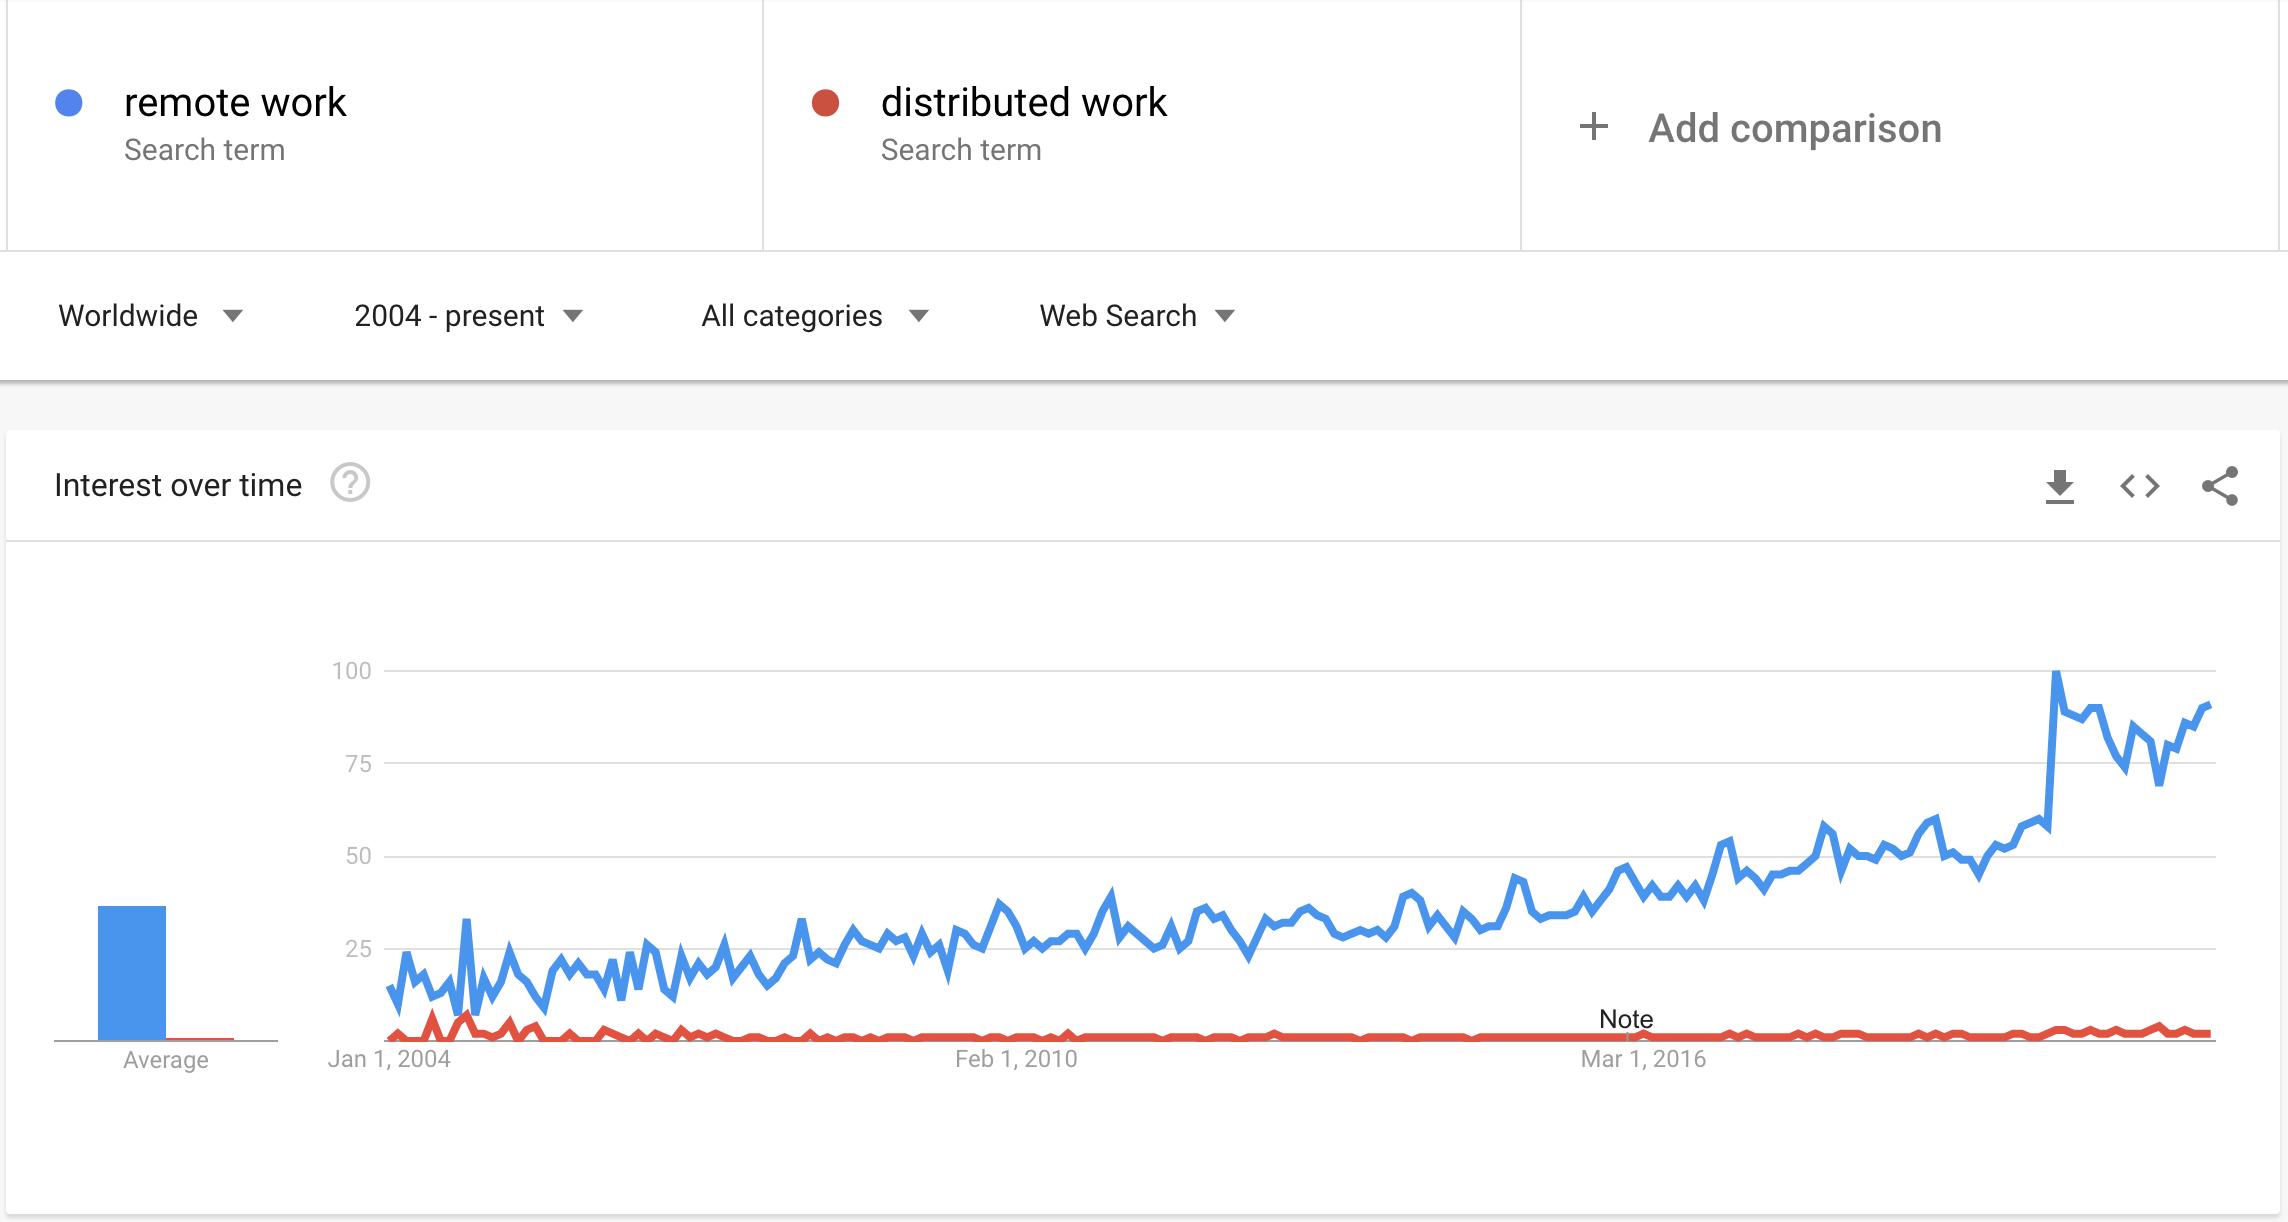 remote vs distributed work